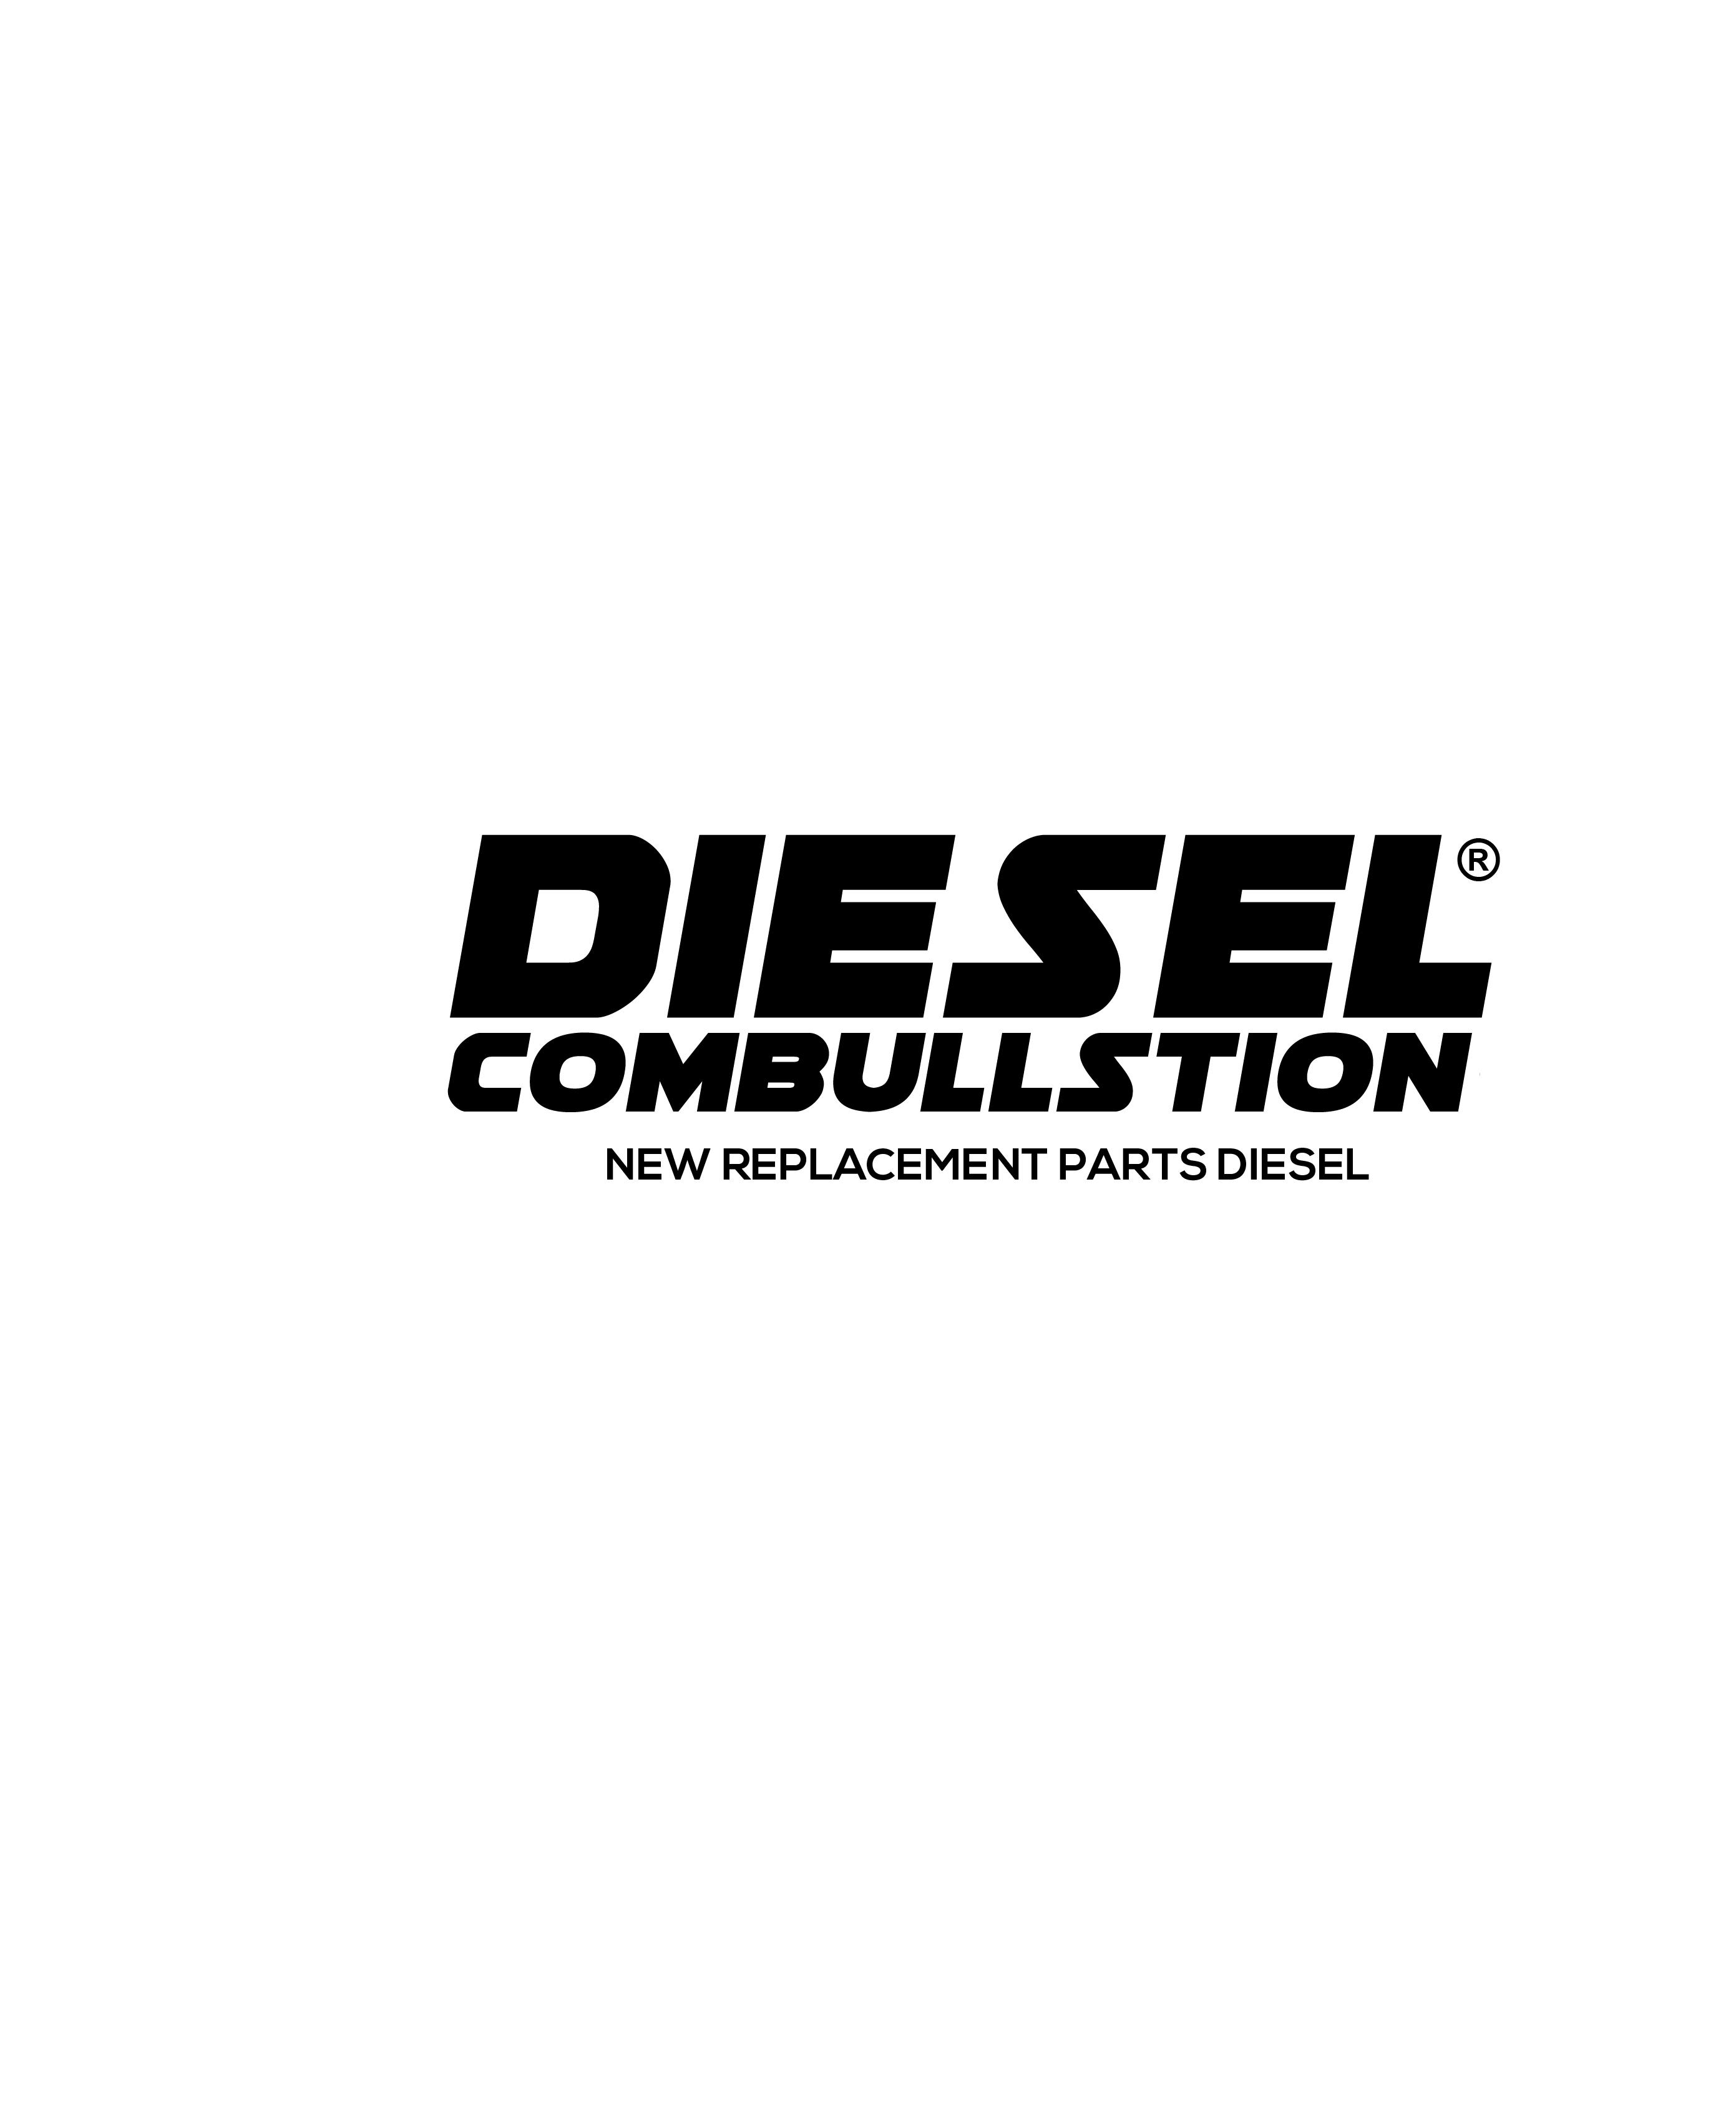 Logo vendedor destacado: DIESEL COMBULLSTION<